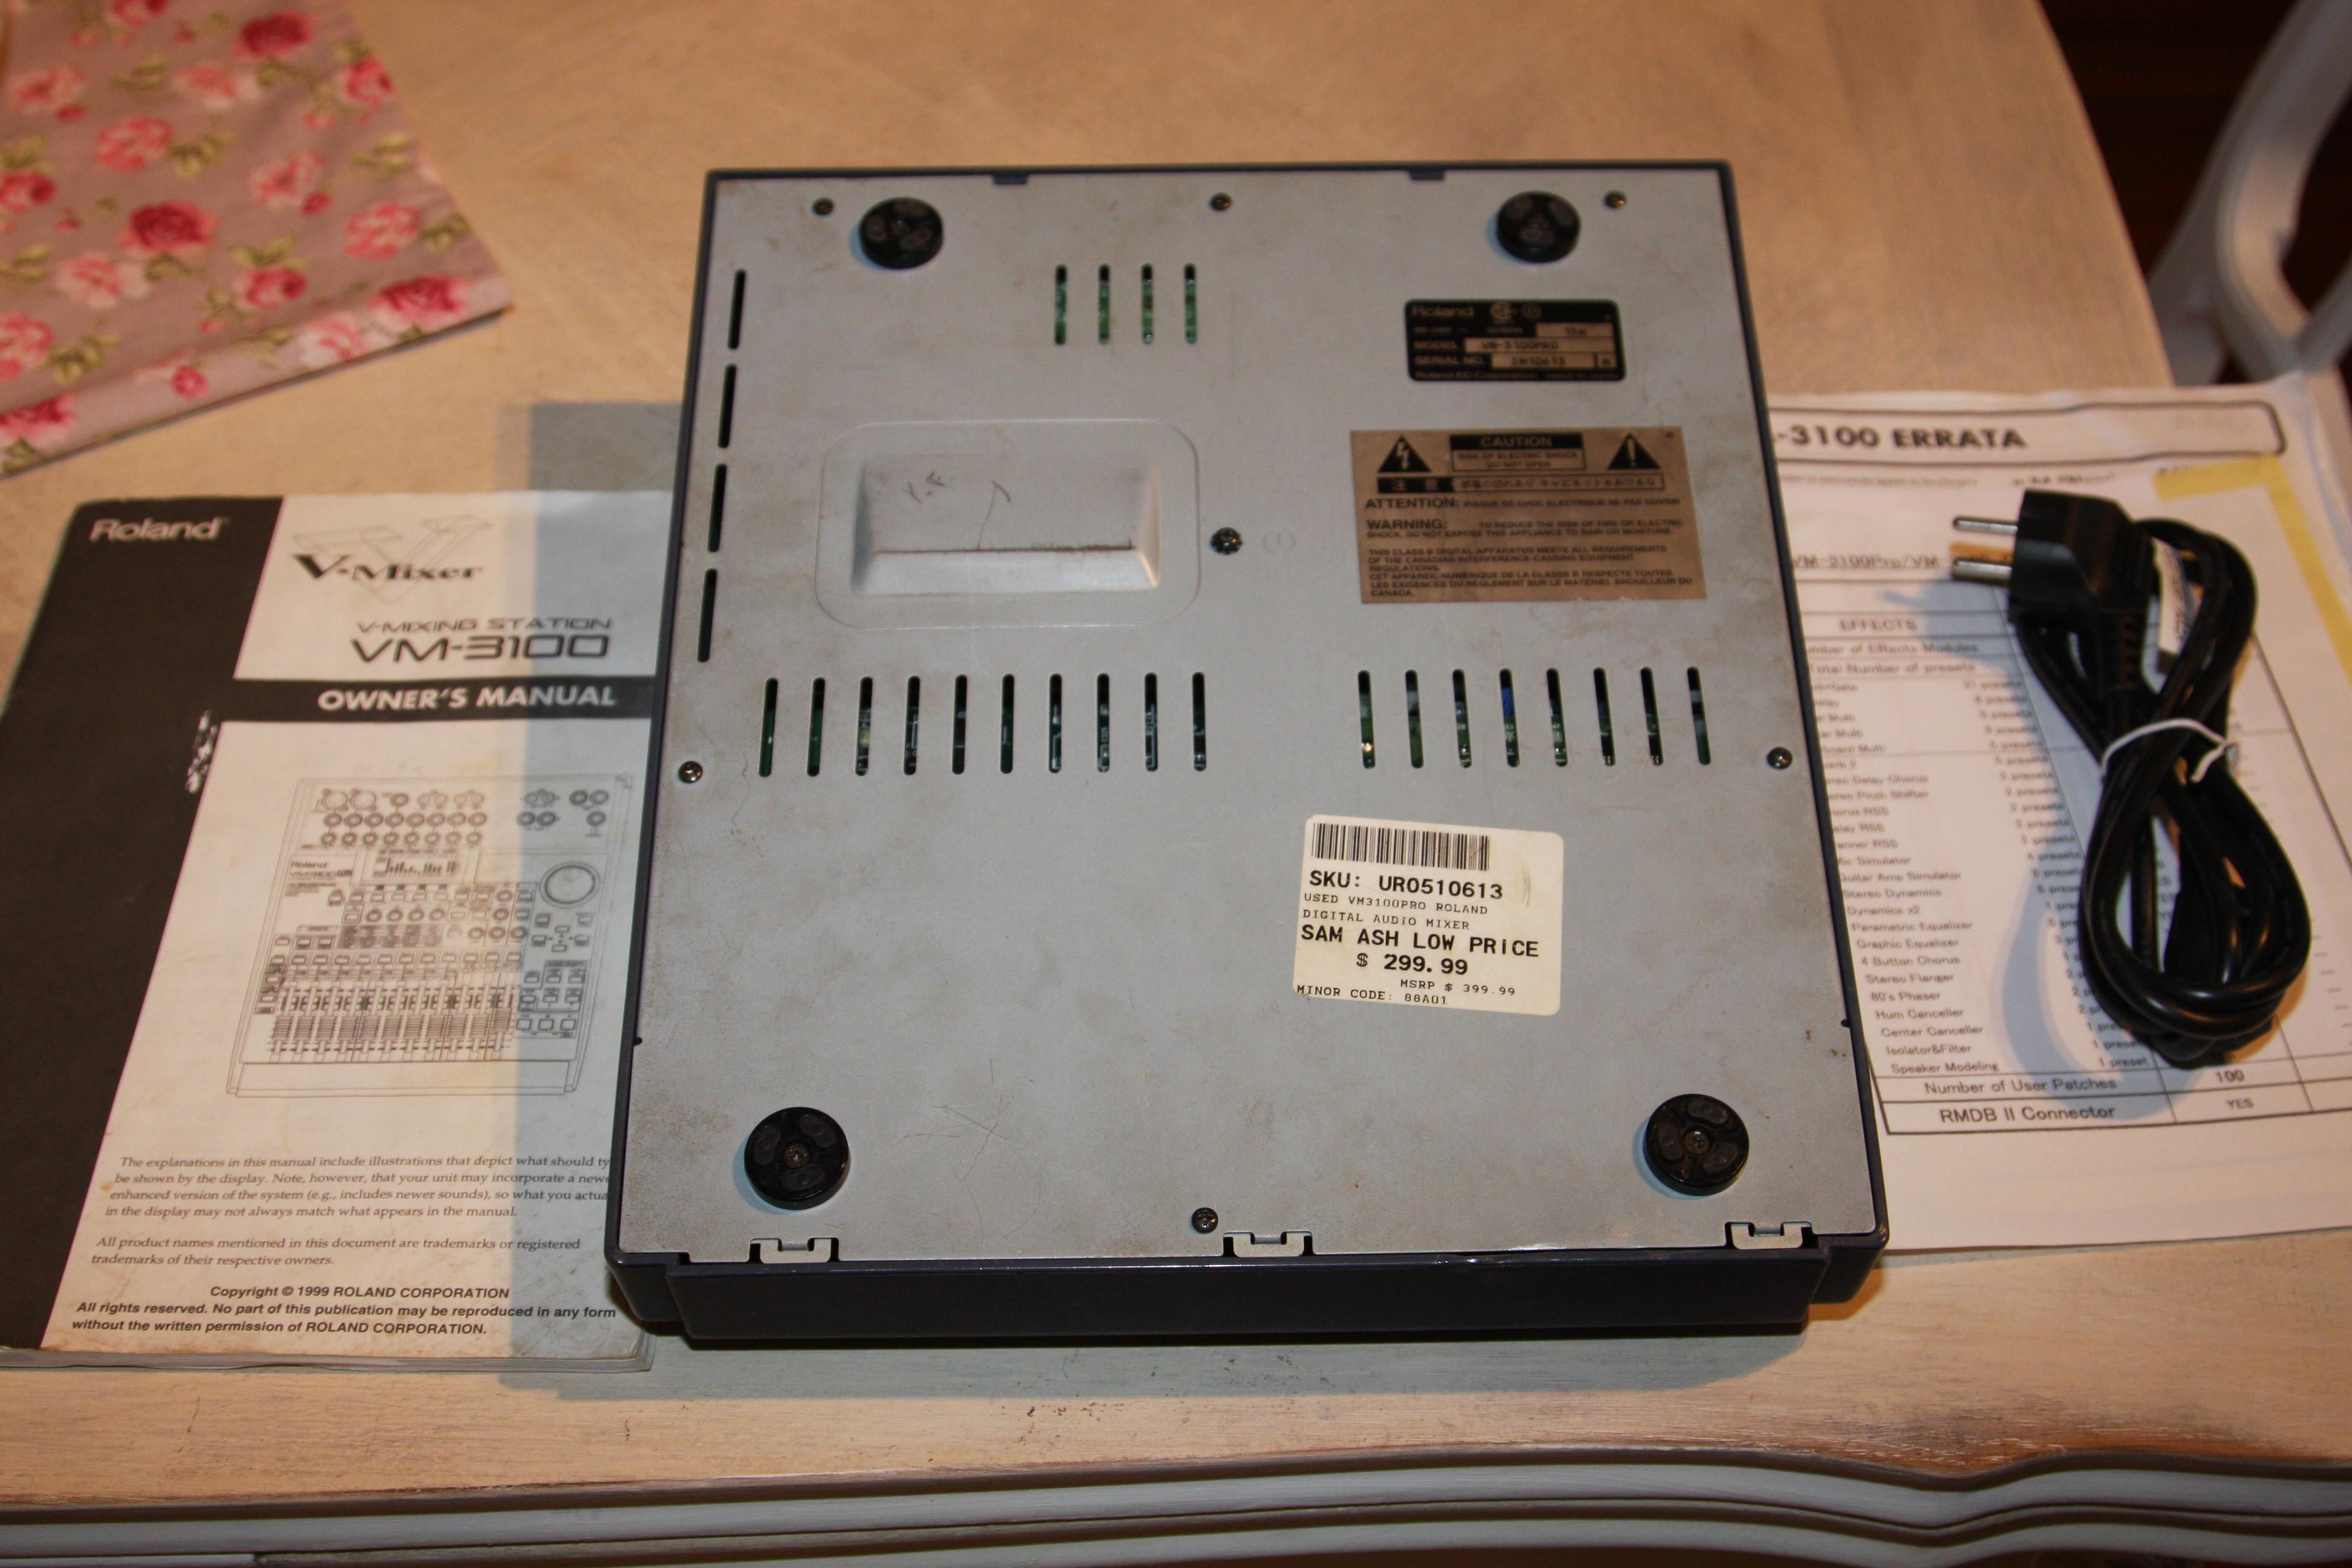 Roland vm 3100 pro инструкция